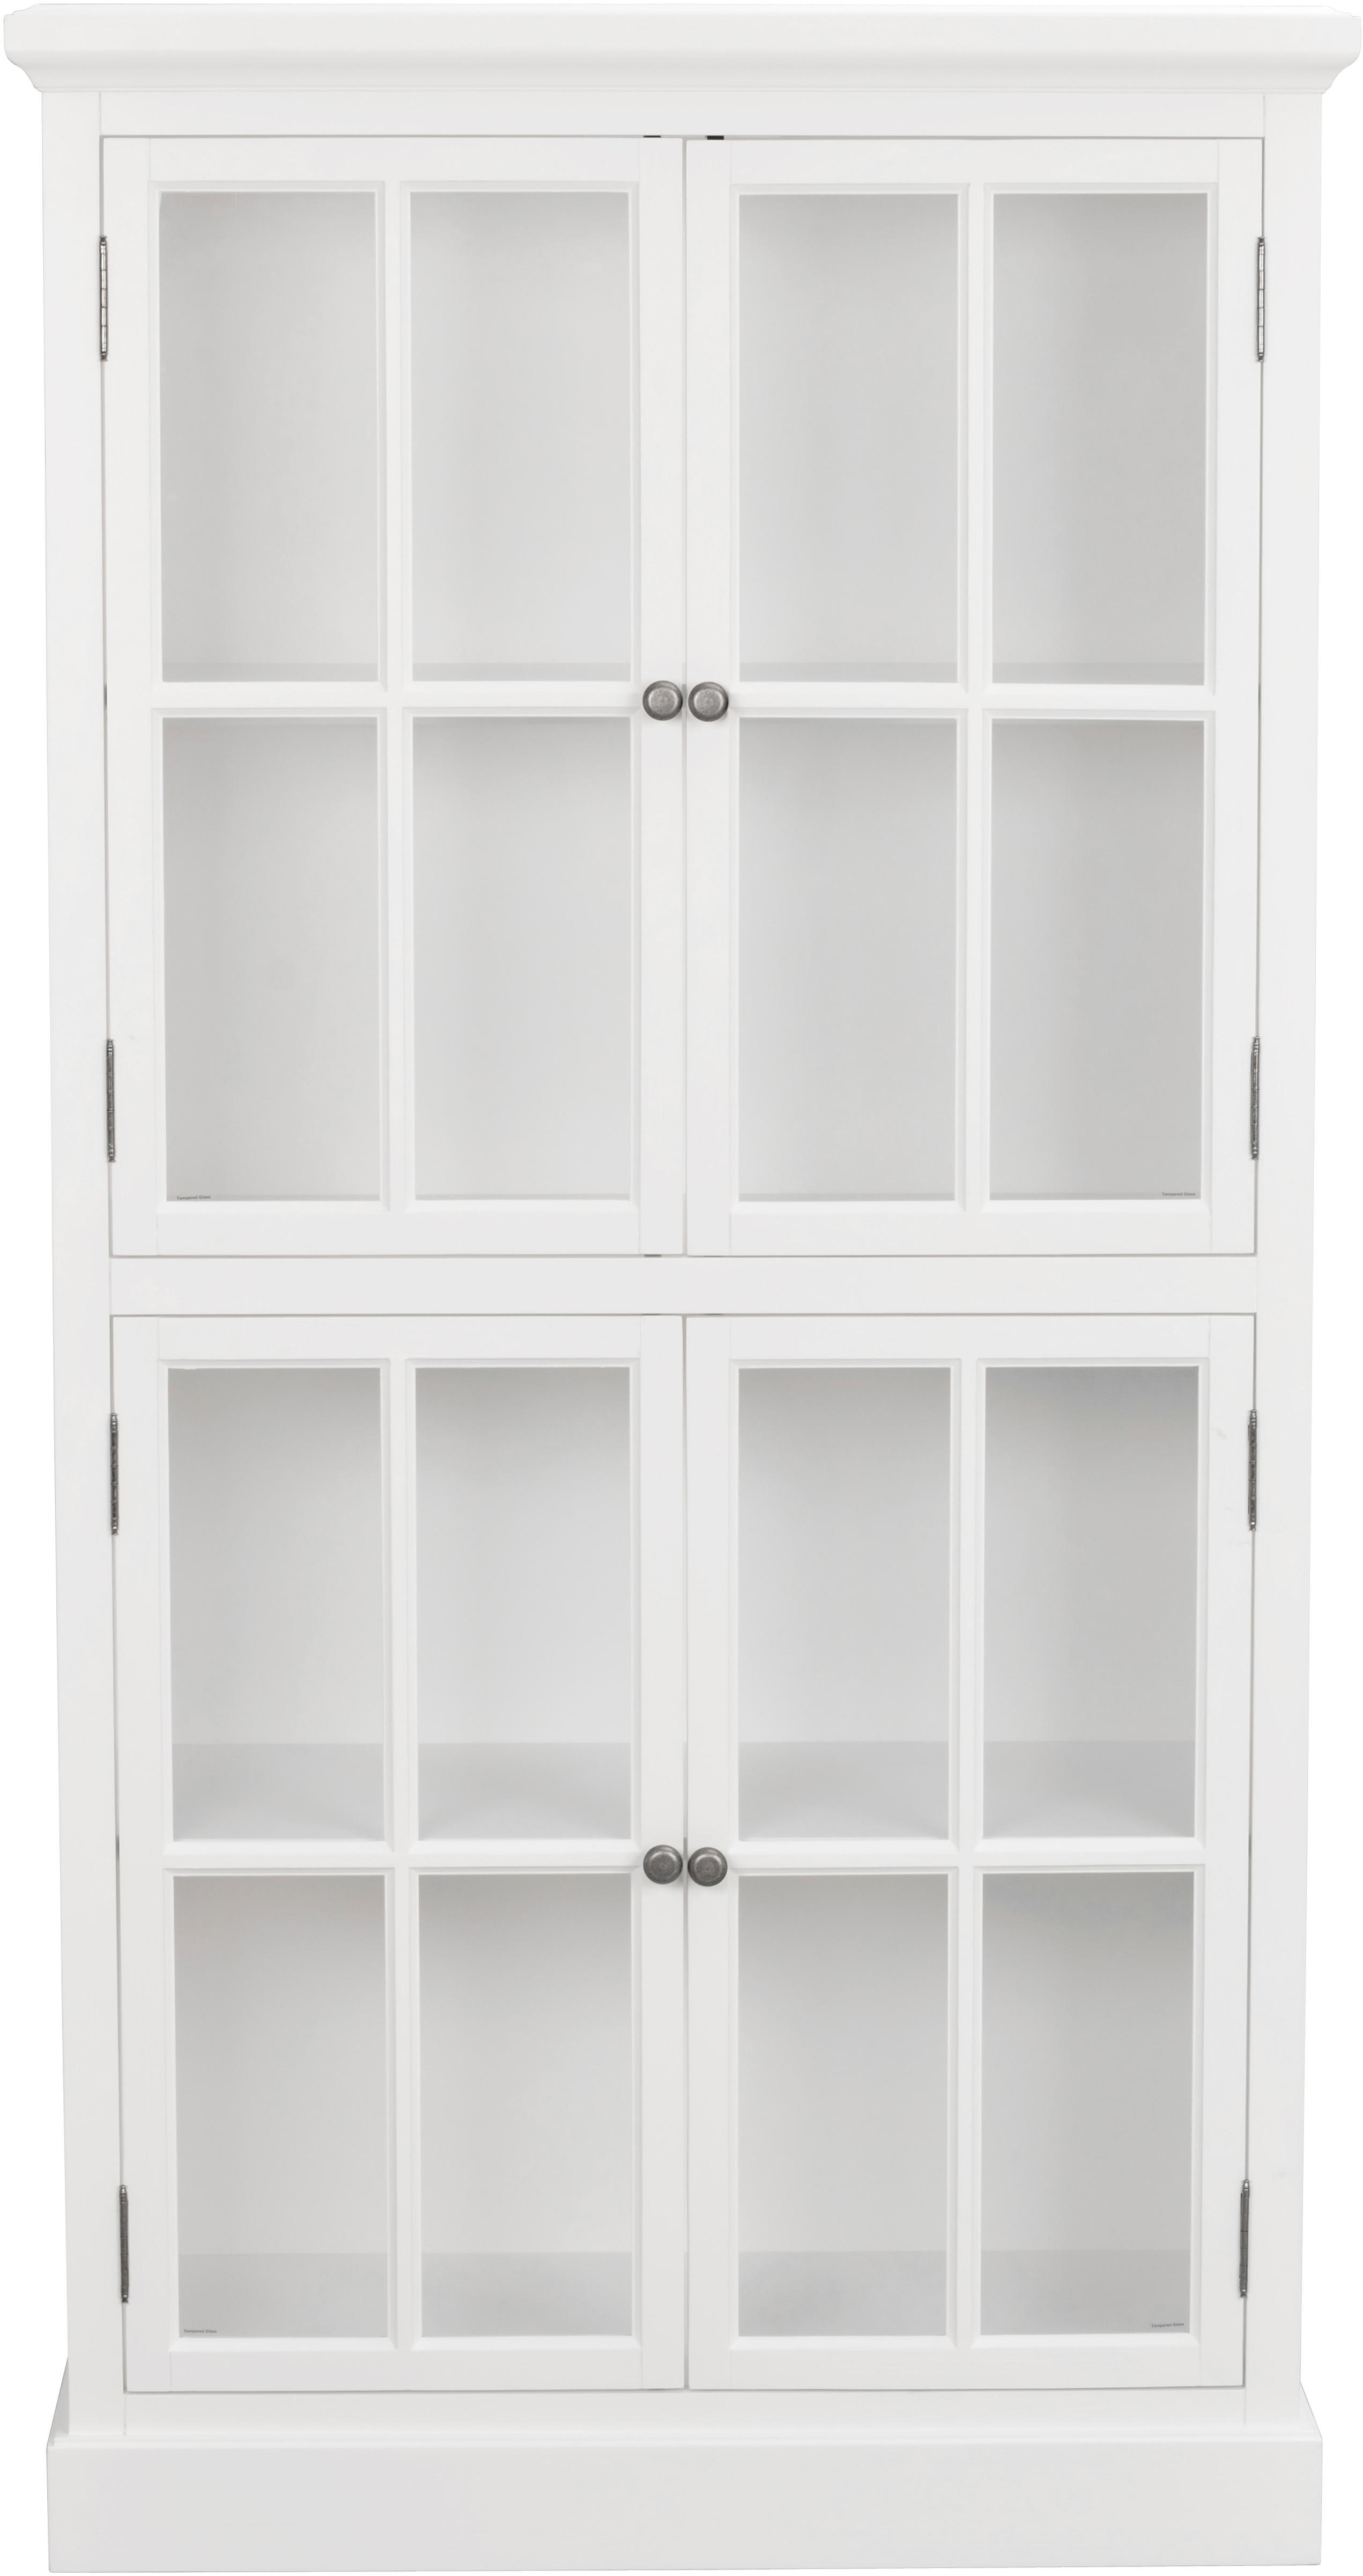 Vitrina de vidrio Lorient, Madera de pino pintada, tablero de fibras de densidad media (MDF), Blanco, An 95 x Al 185 cm